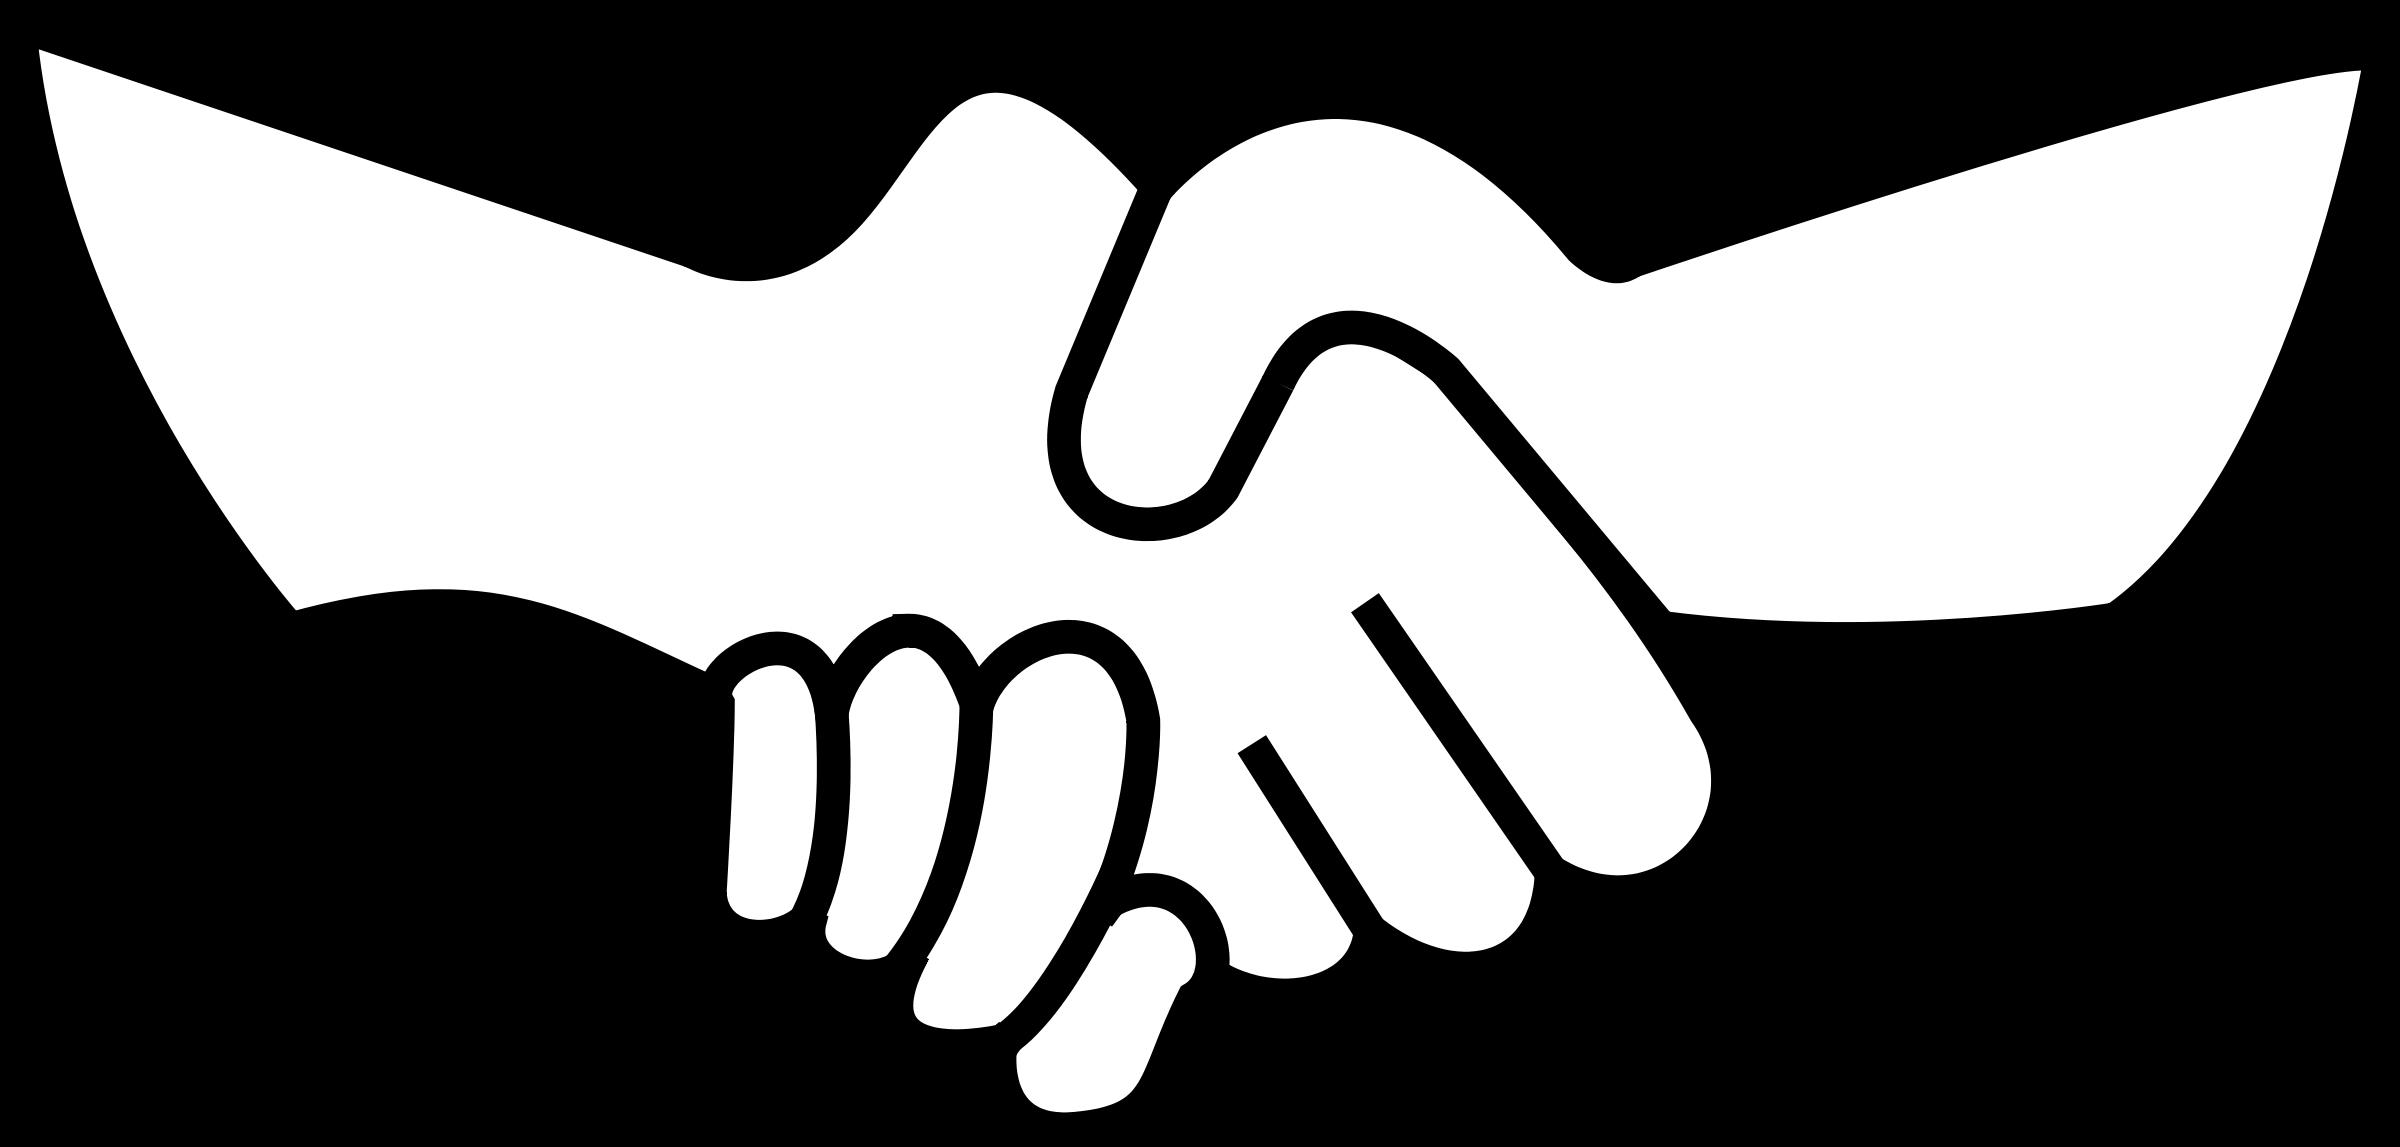 Clipart Handshake 02 Clipart Panda Free Clipart Images